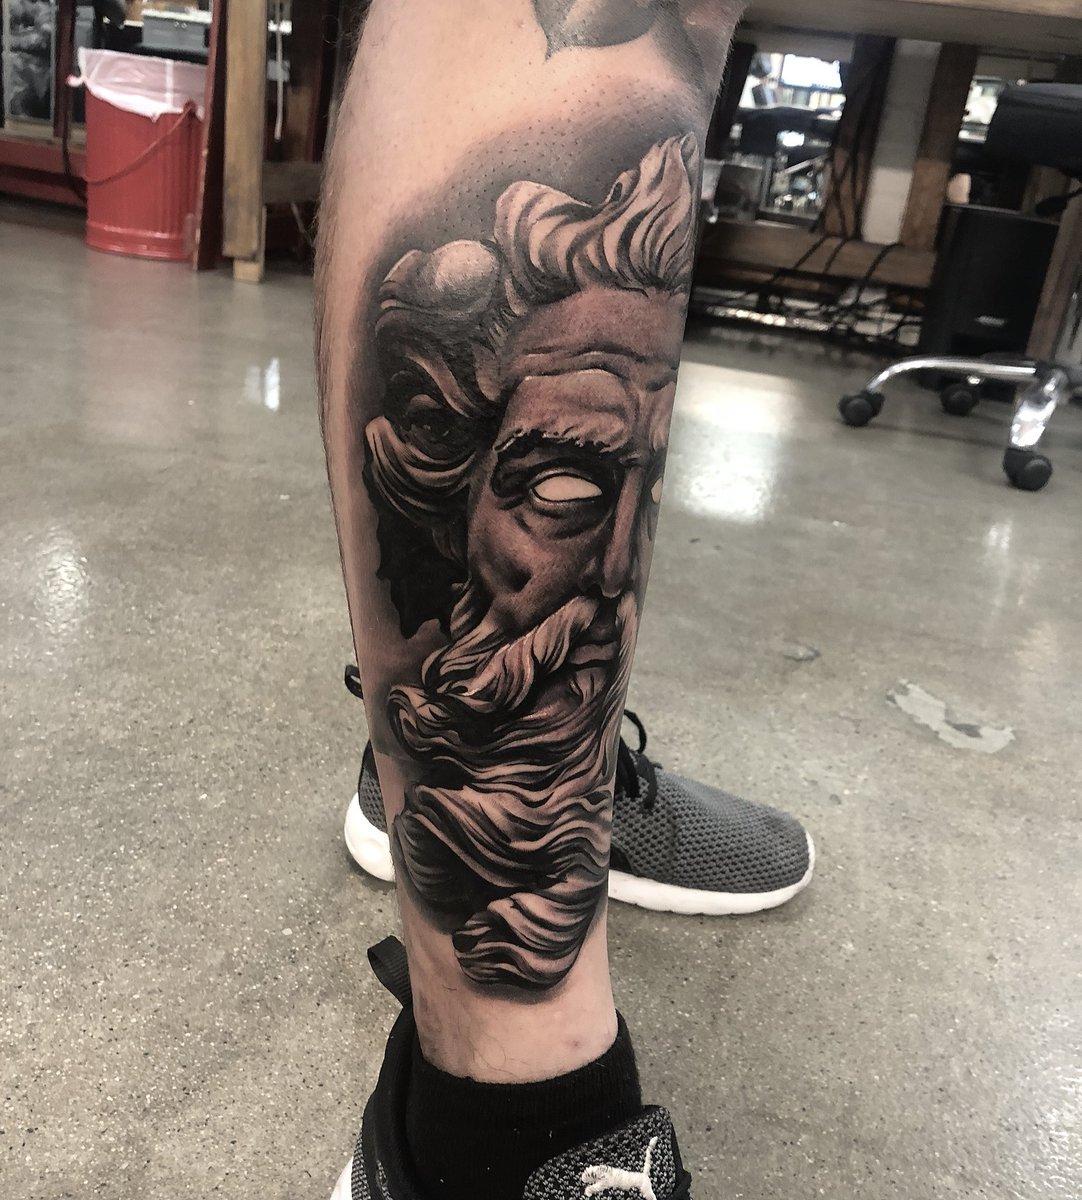 Poseidon Tattoo by me